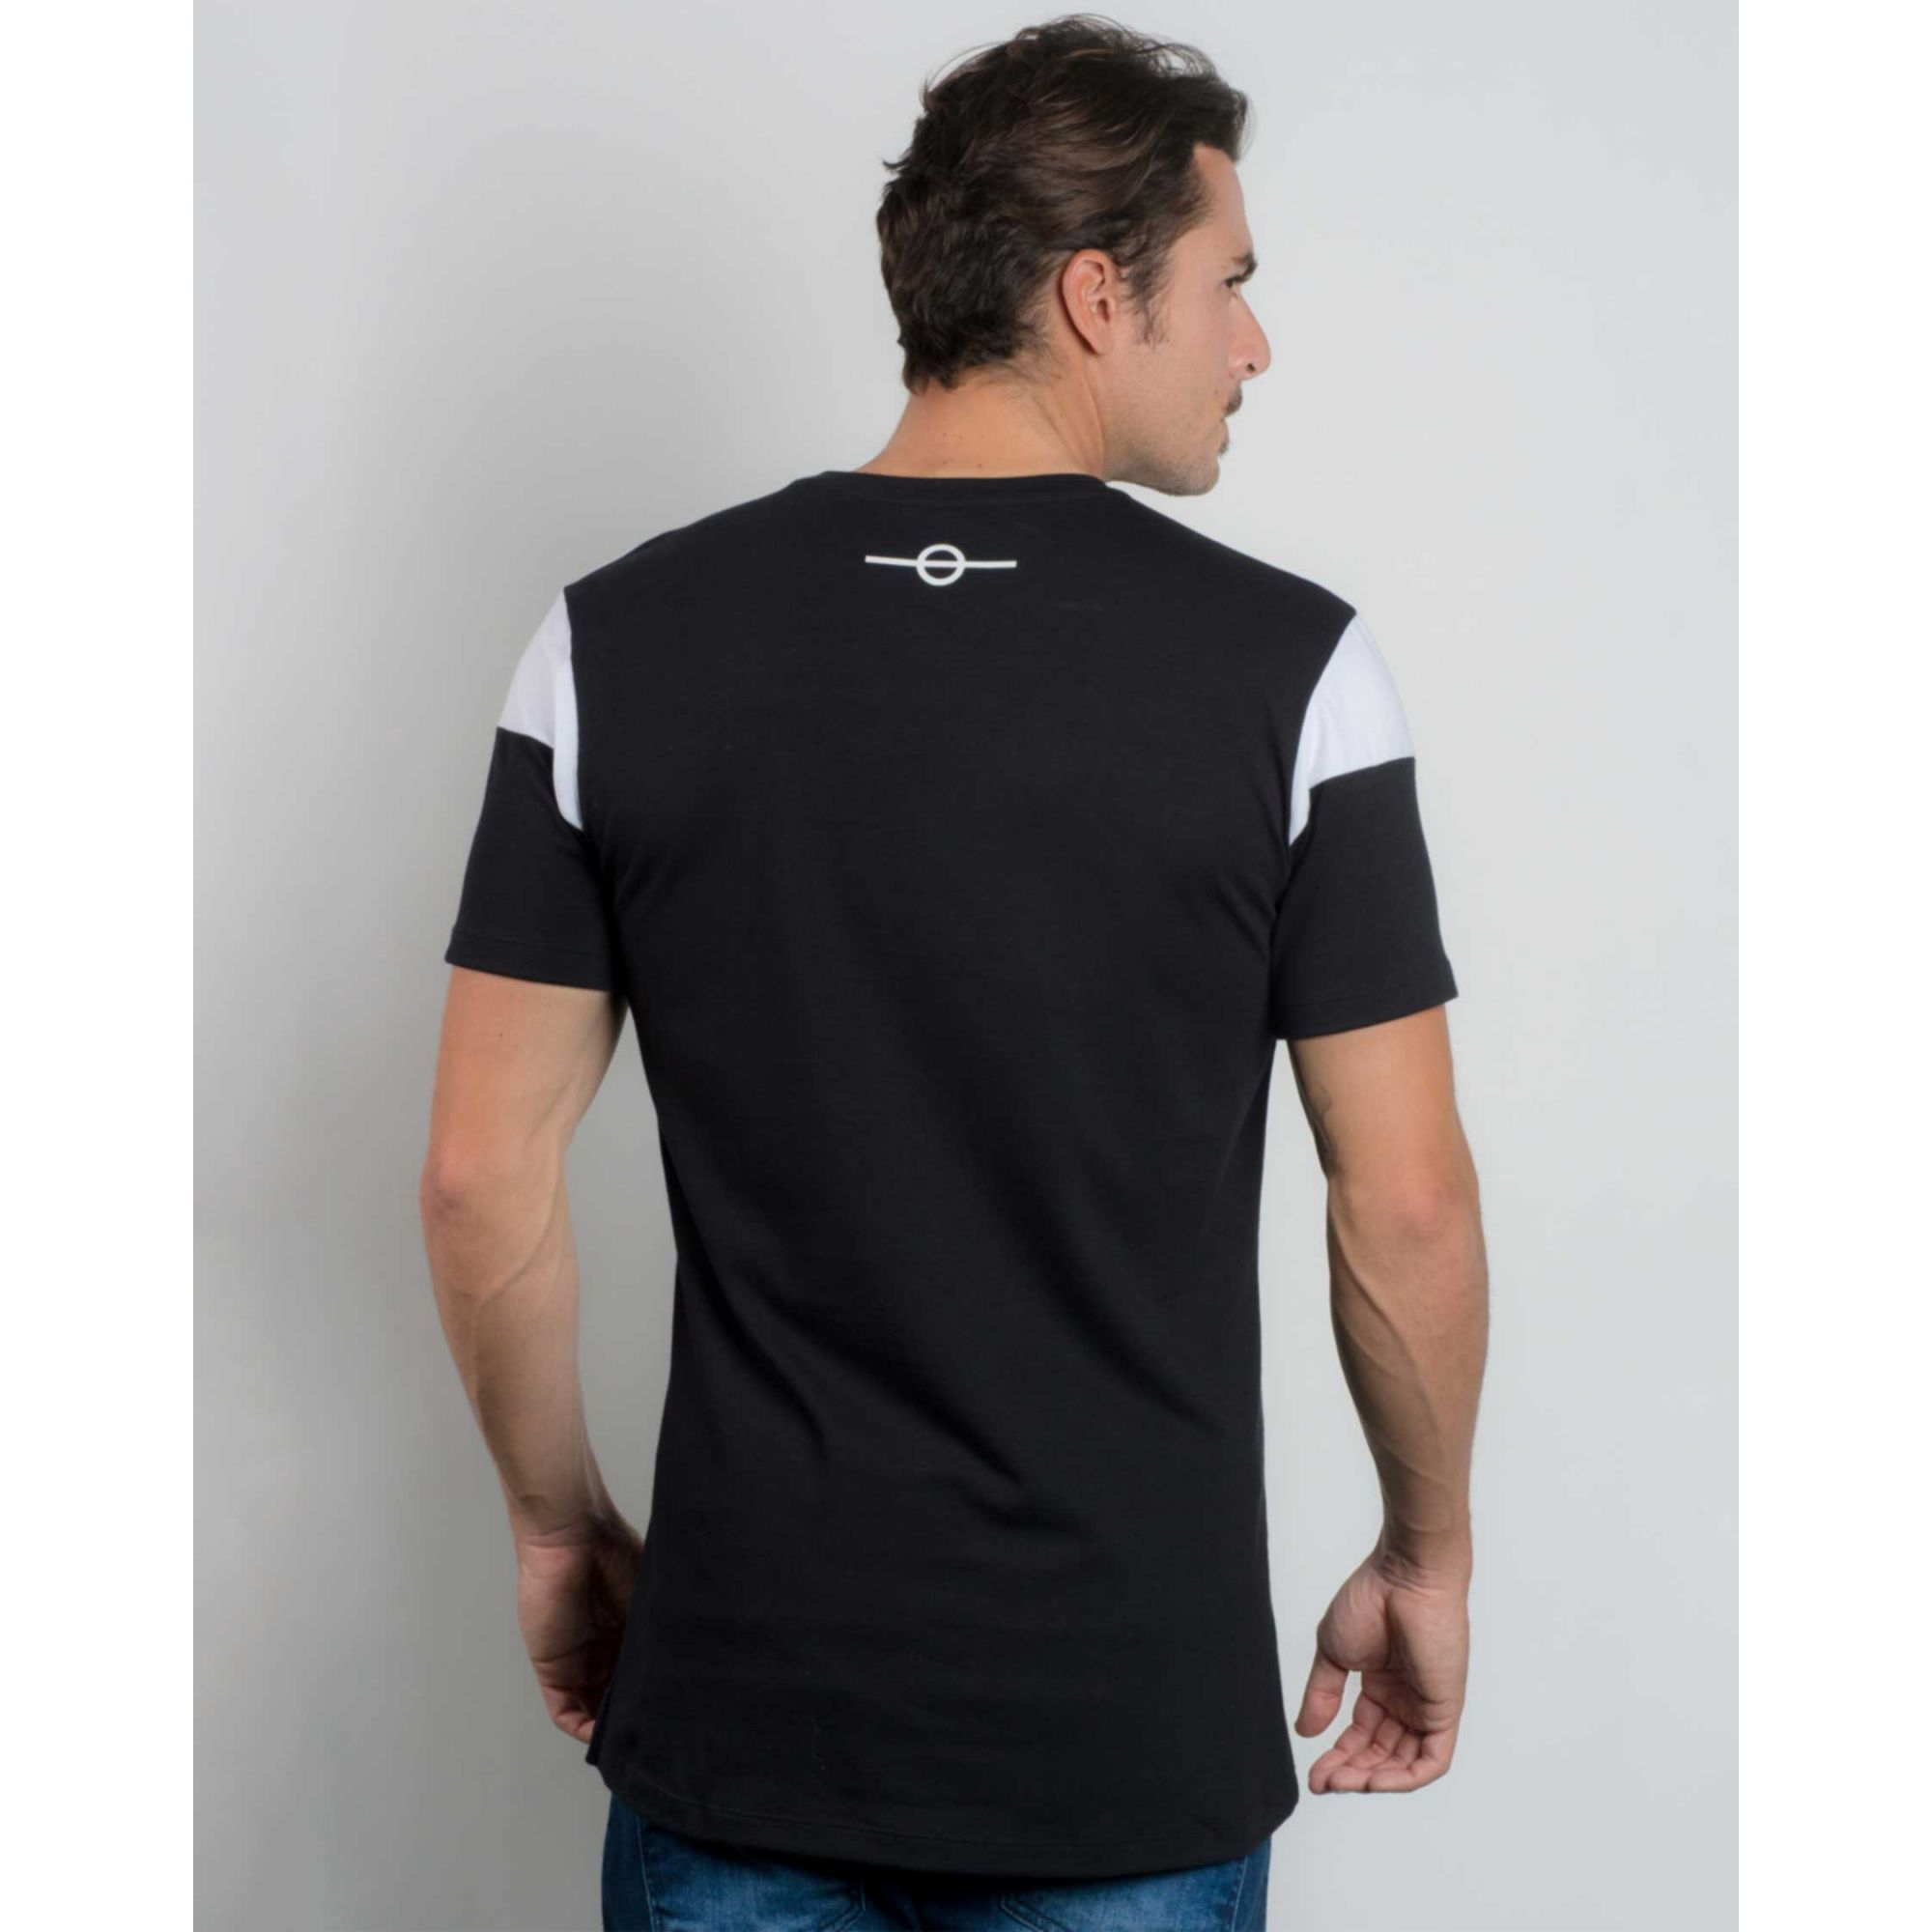 Camiseta Buh Bicolor Metal White & Black